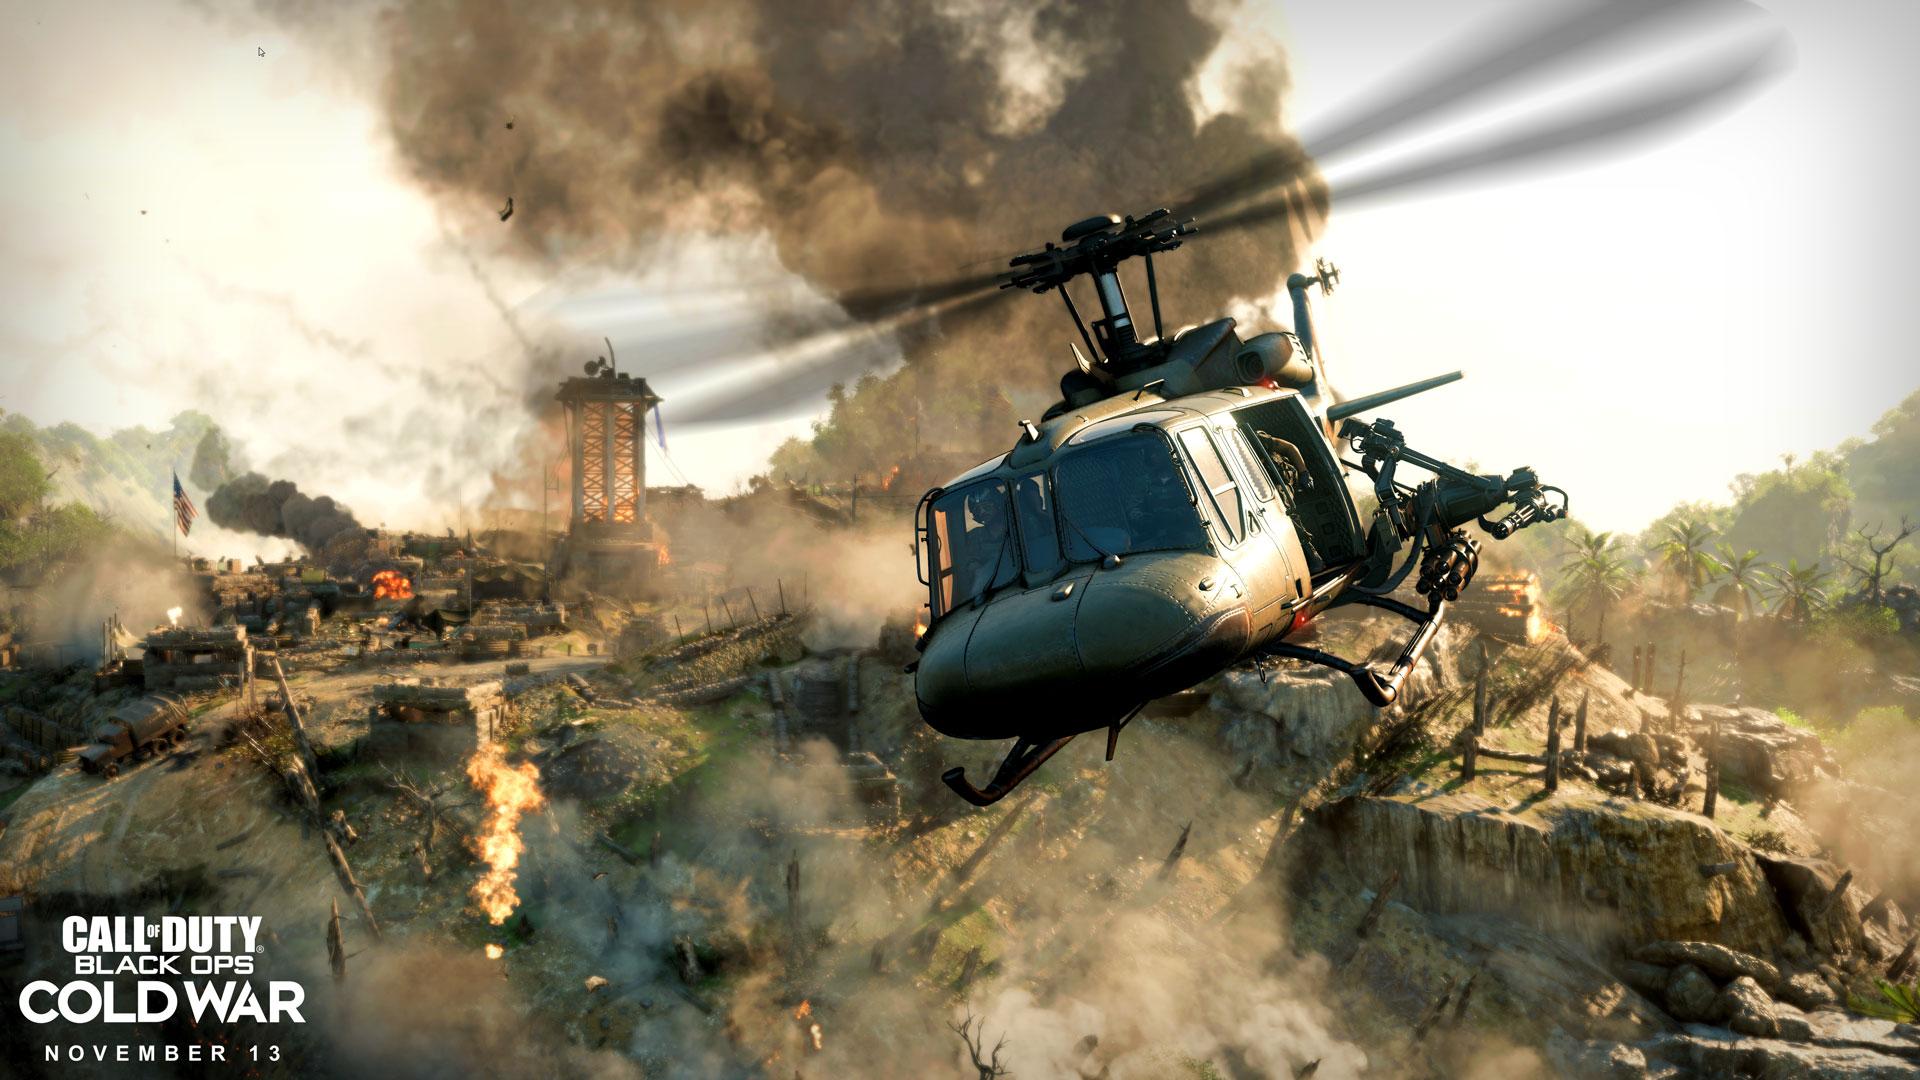 Call of Duty: Black Ops Cold War screenshot 2